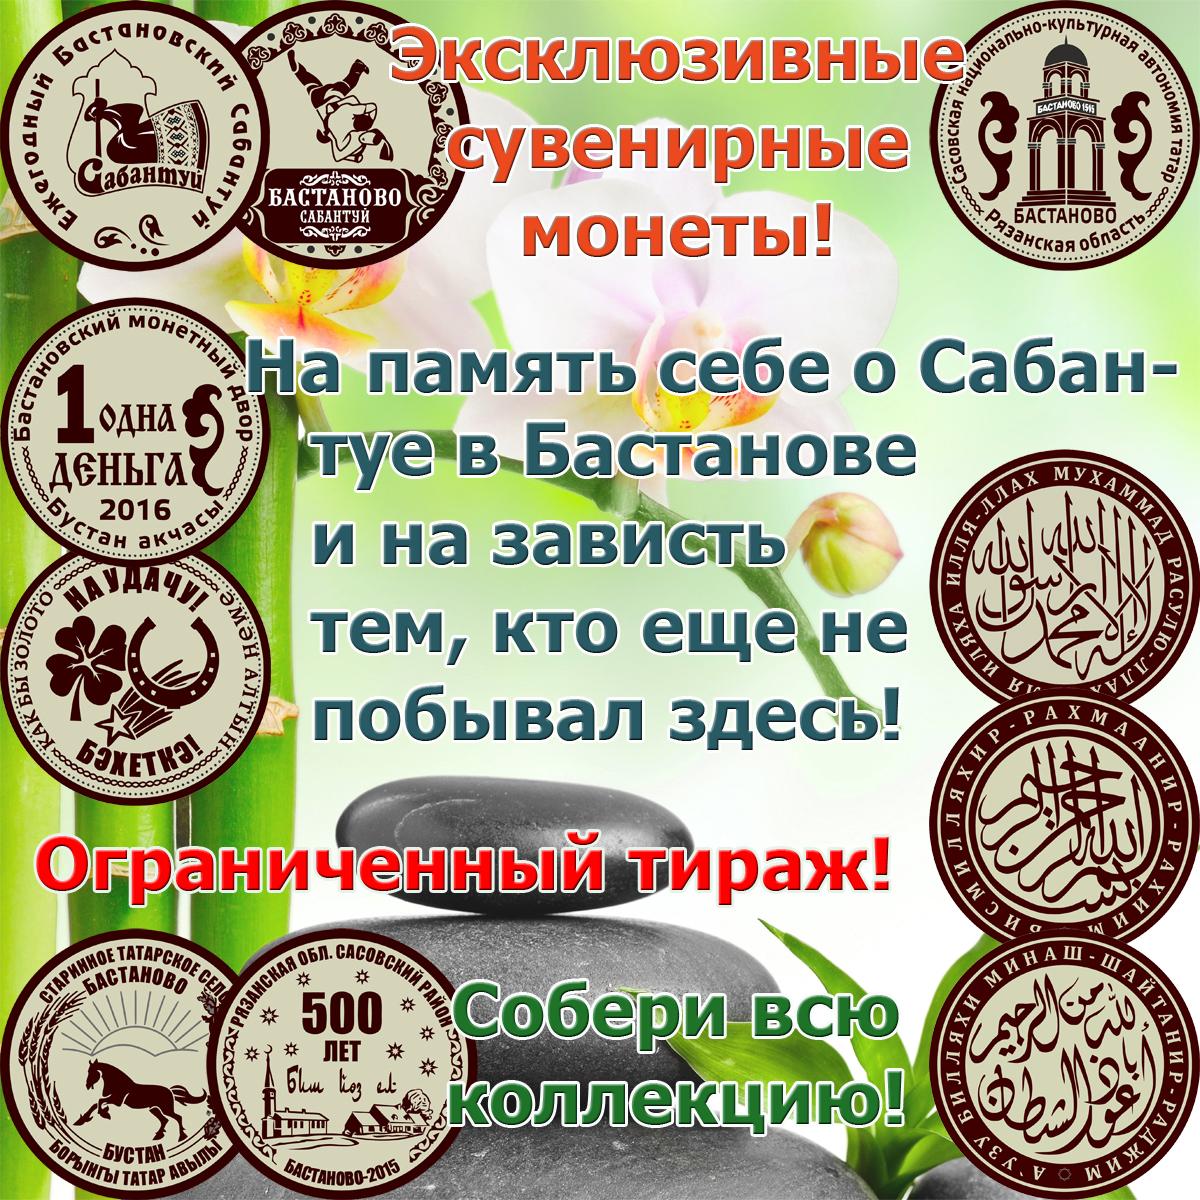 banner-monety-1200pxs